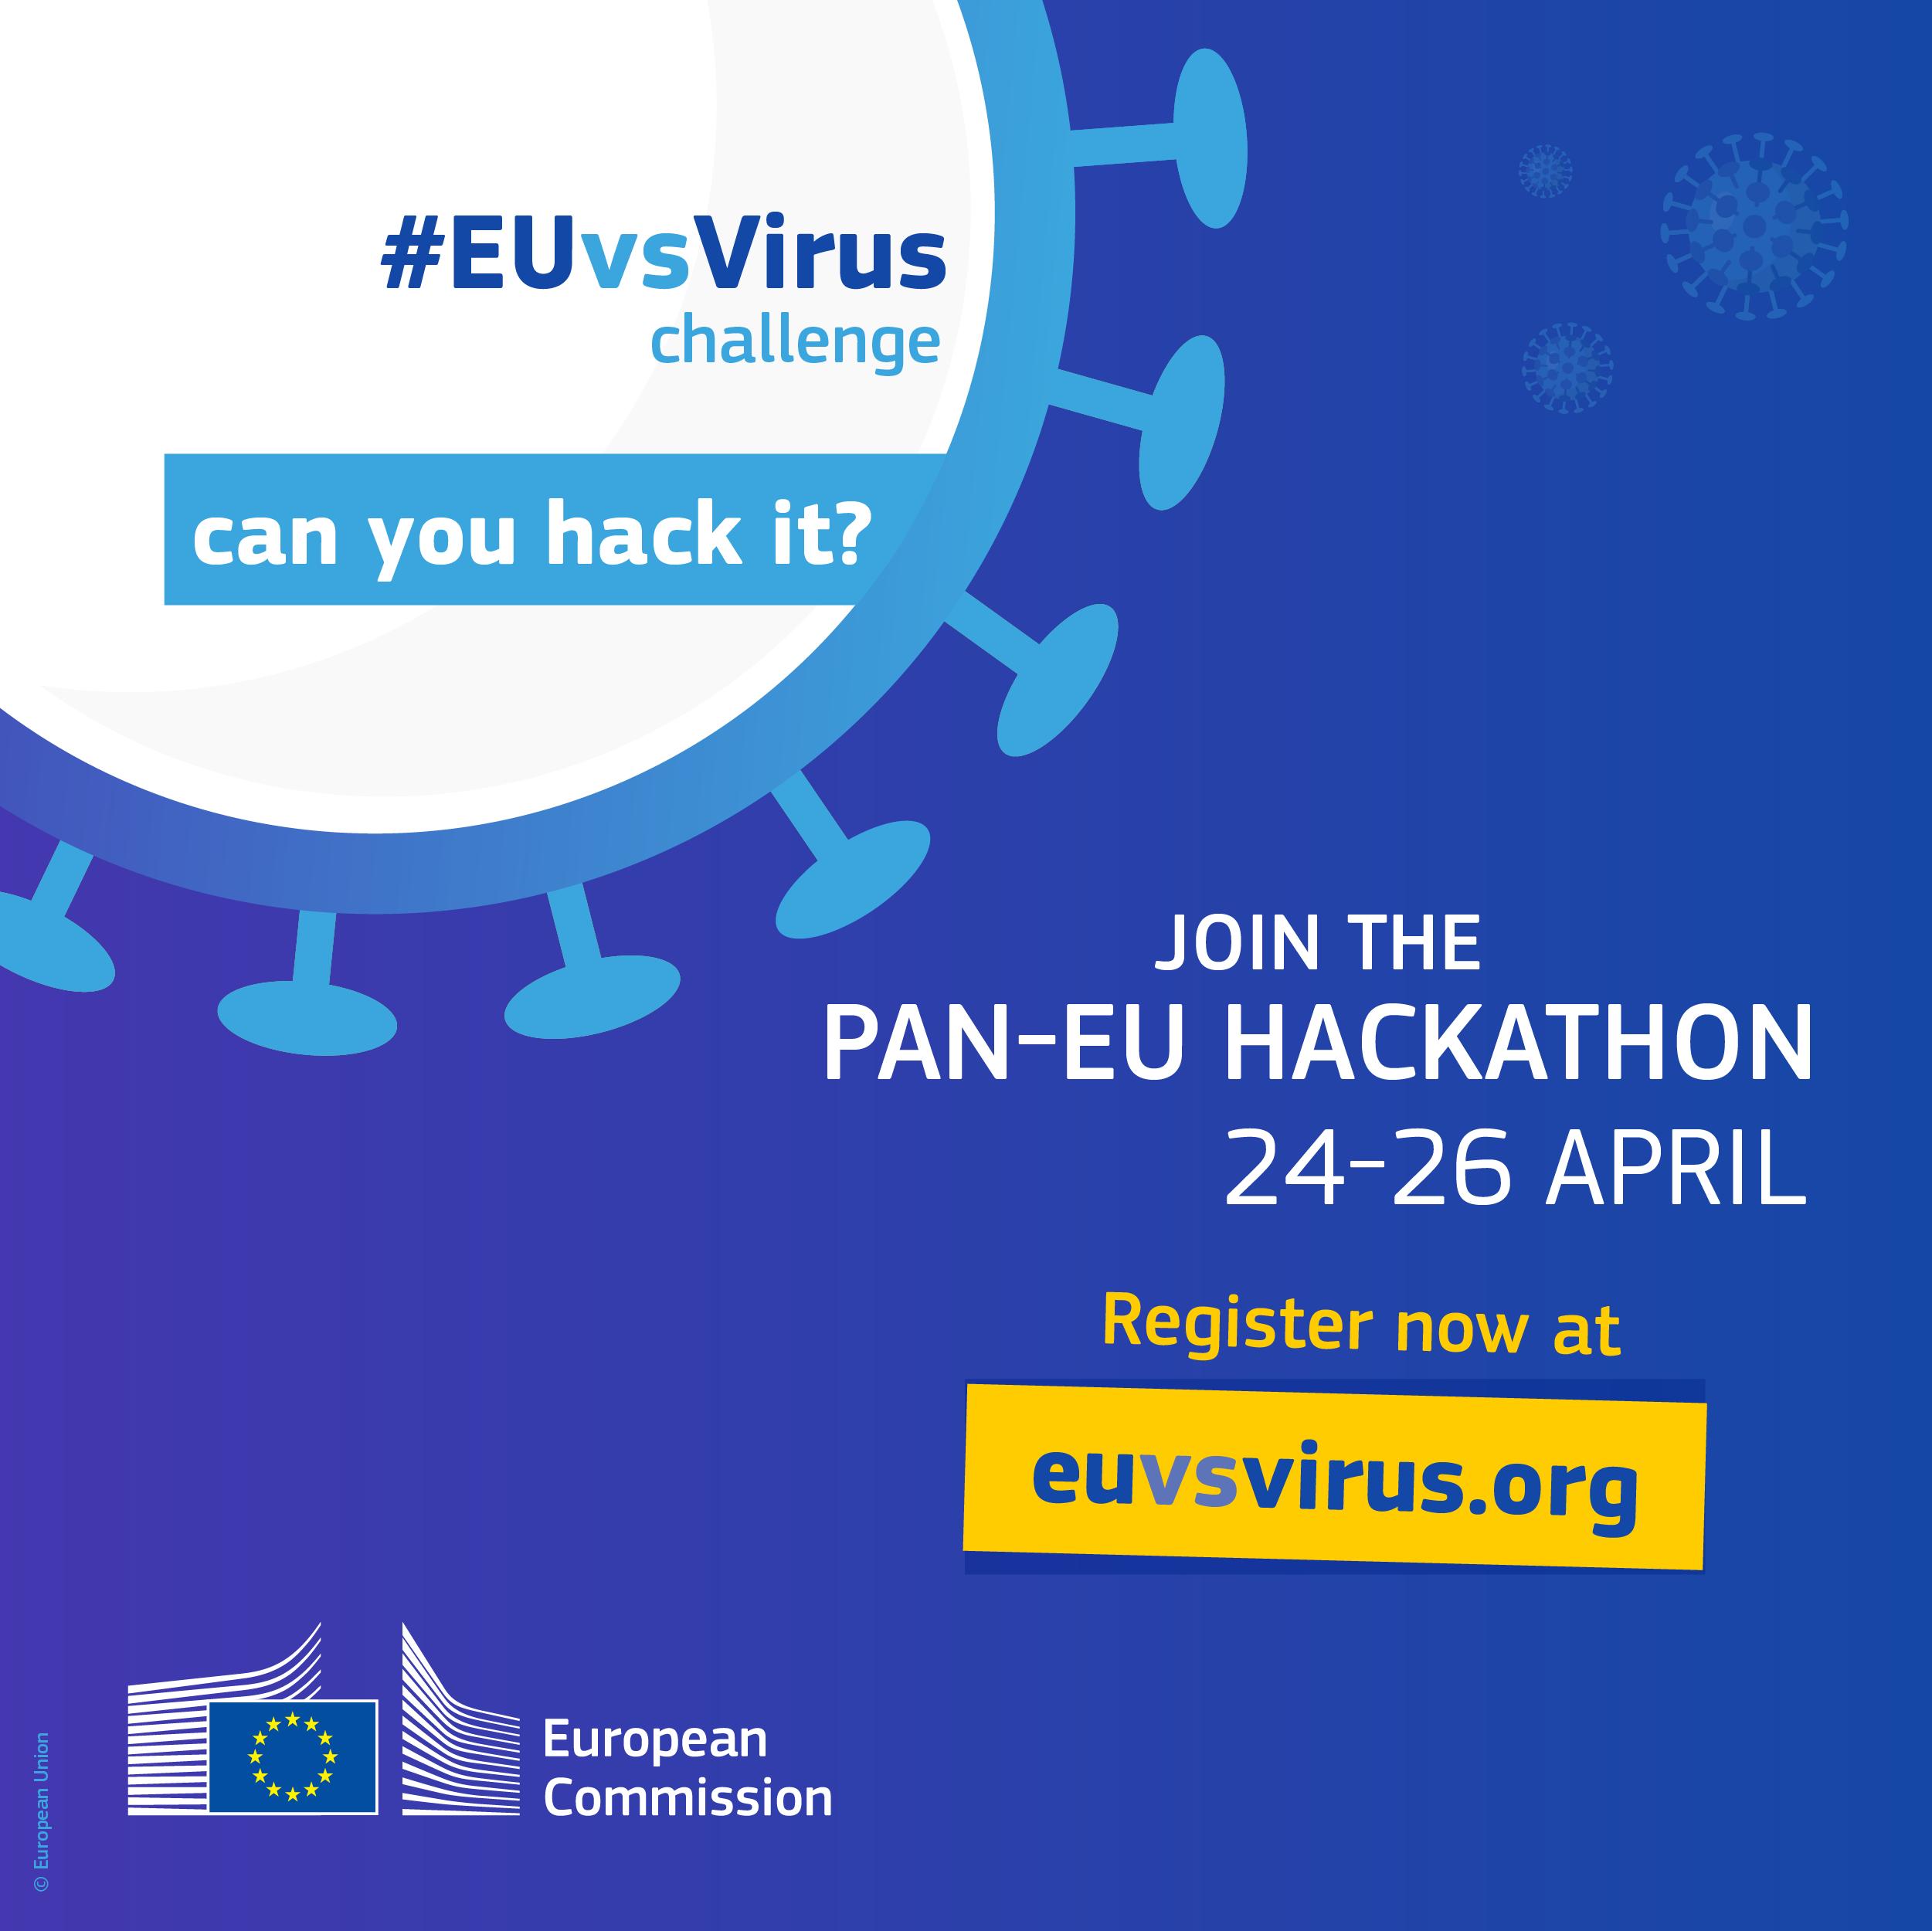 Prijavite se na hackathon #EUvsVirus